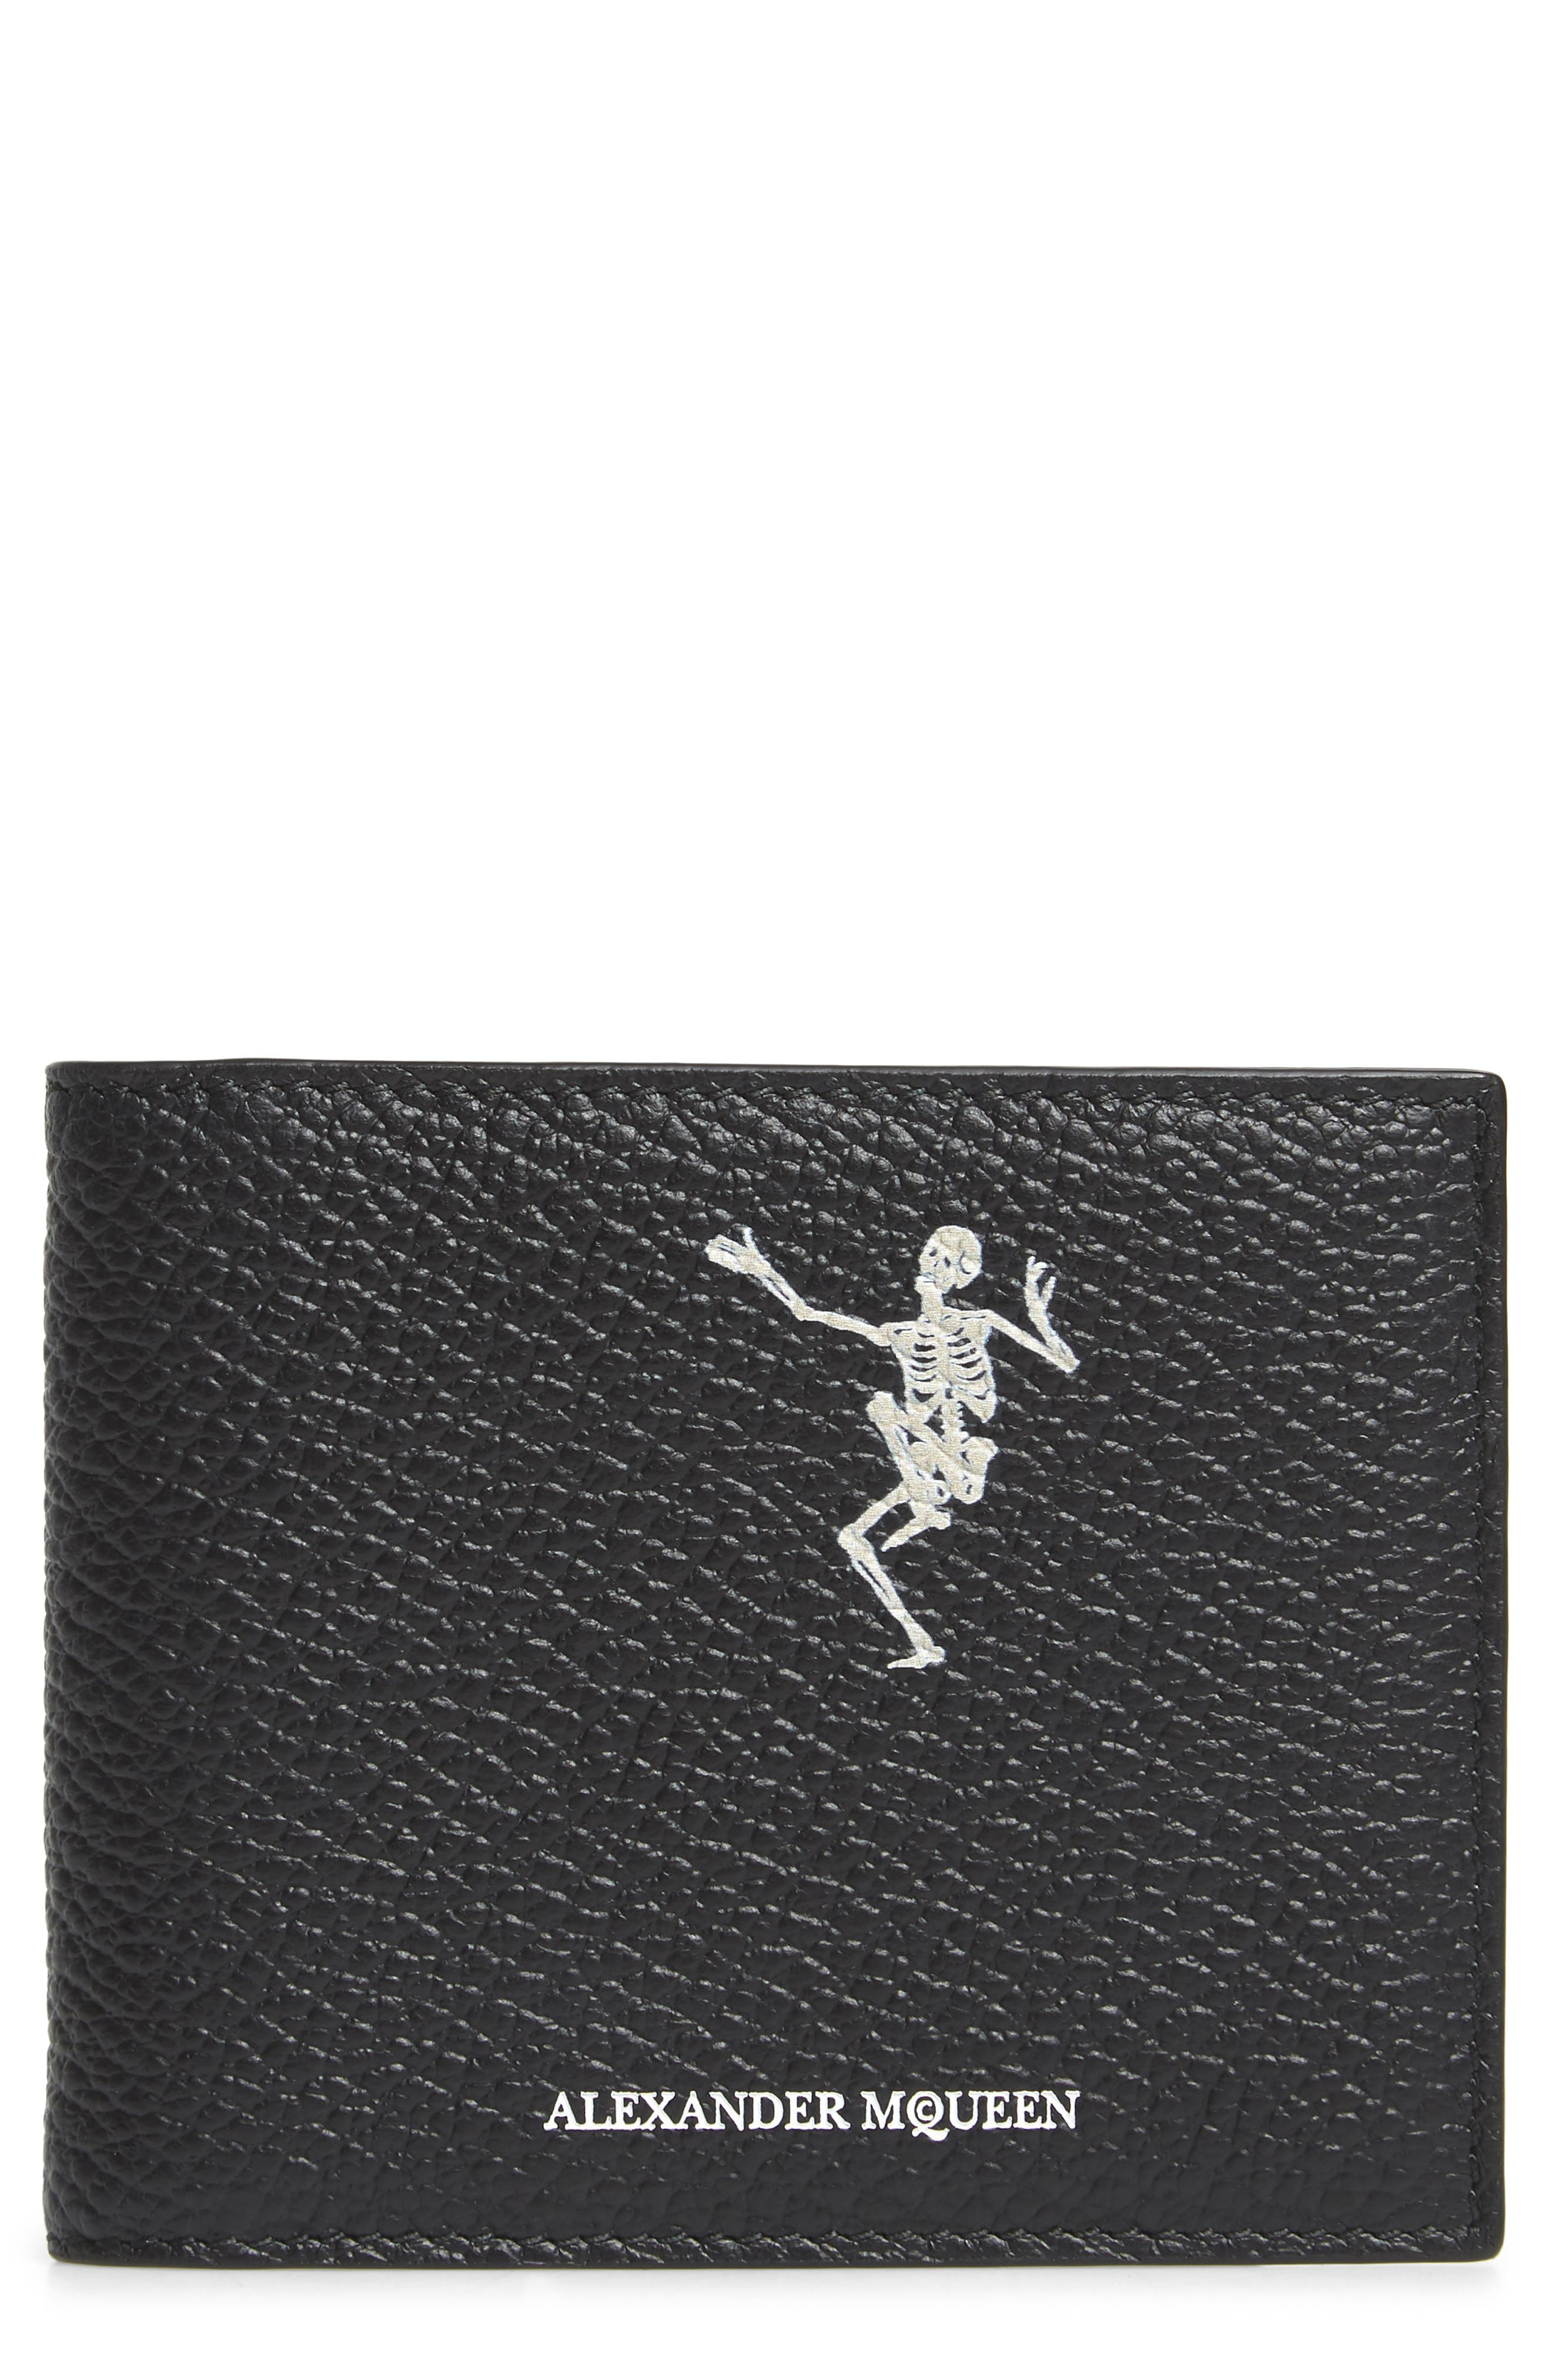 Alexander McQueen Dancing Skeleton Leather Money Clip Card Case